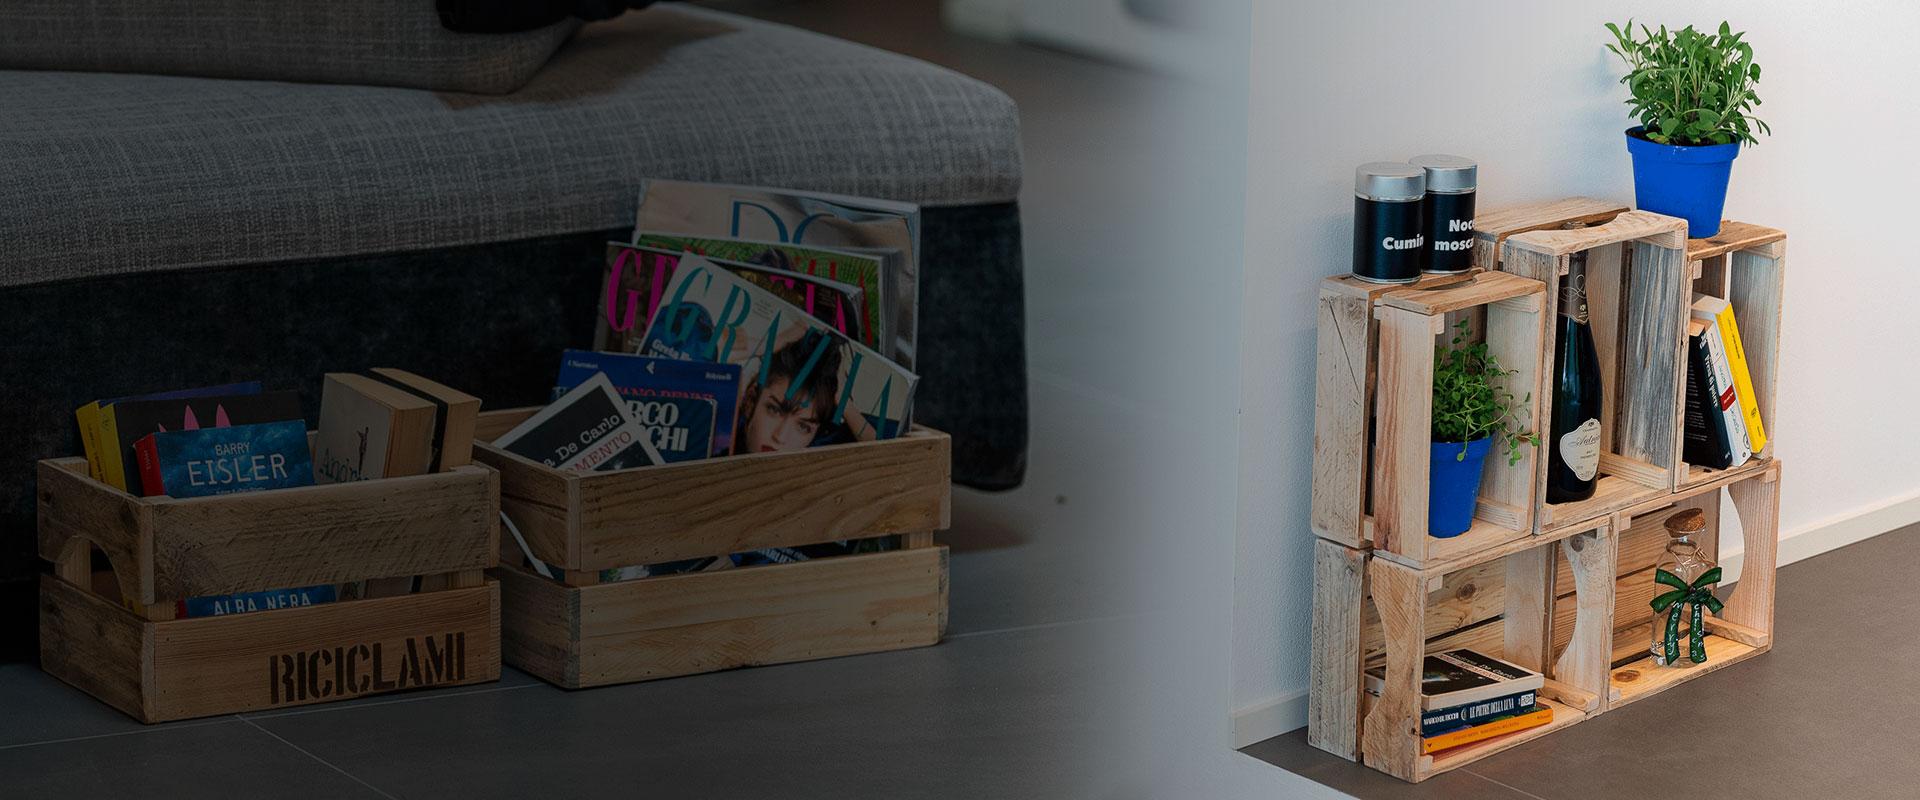 Cassette in legno dai mille utilizzi